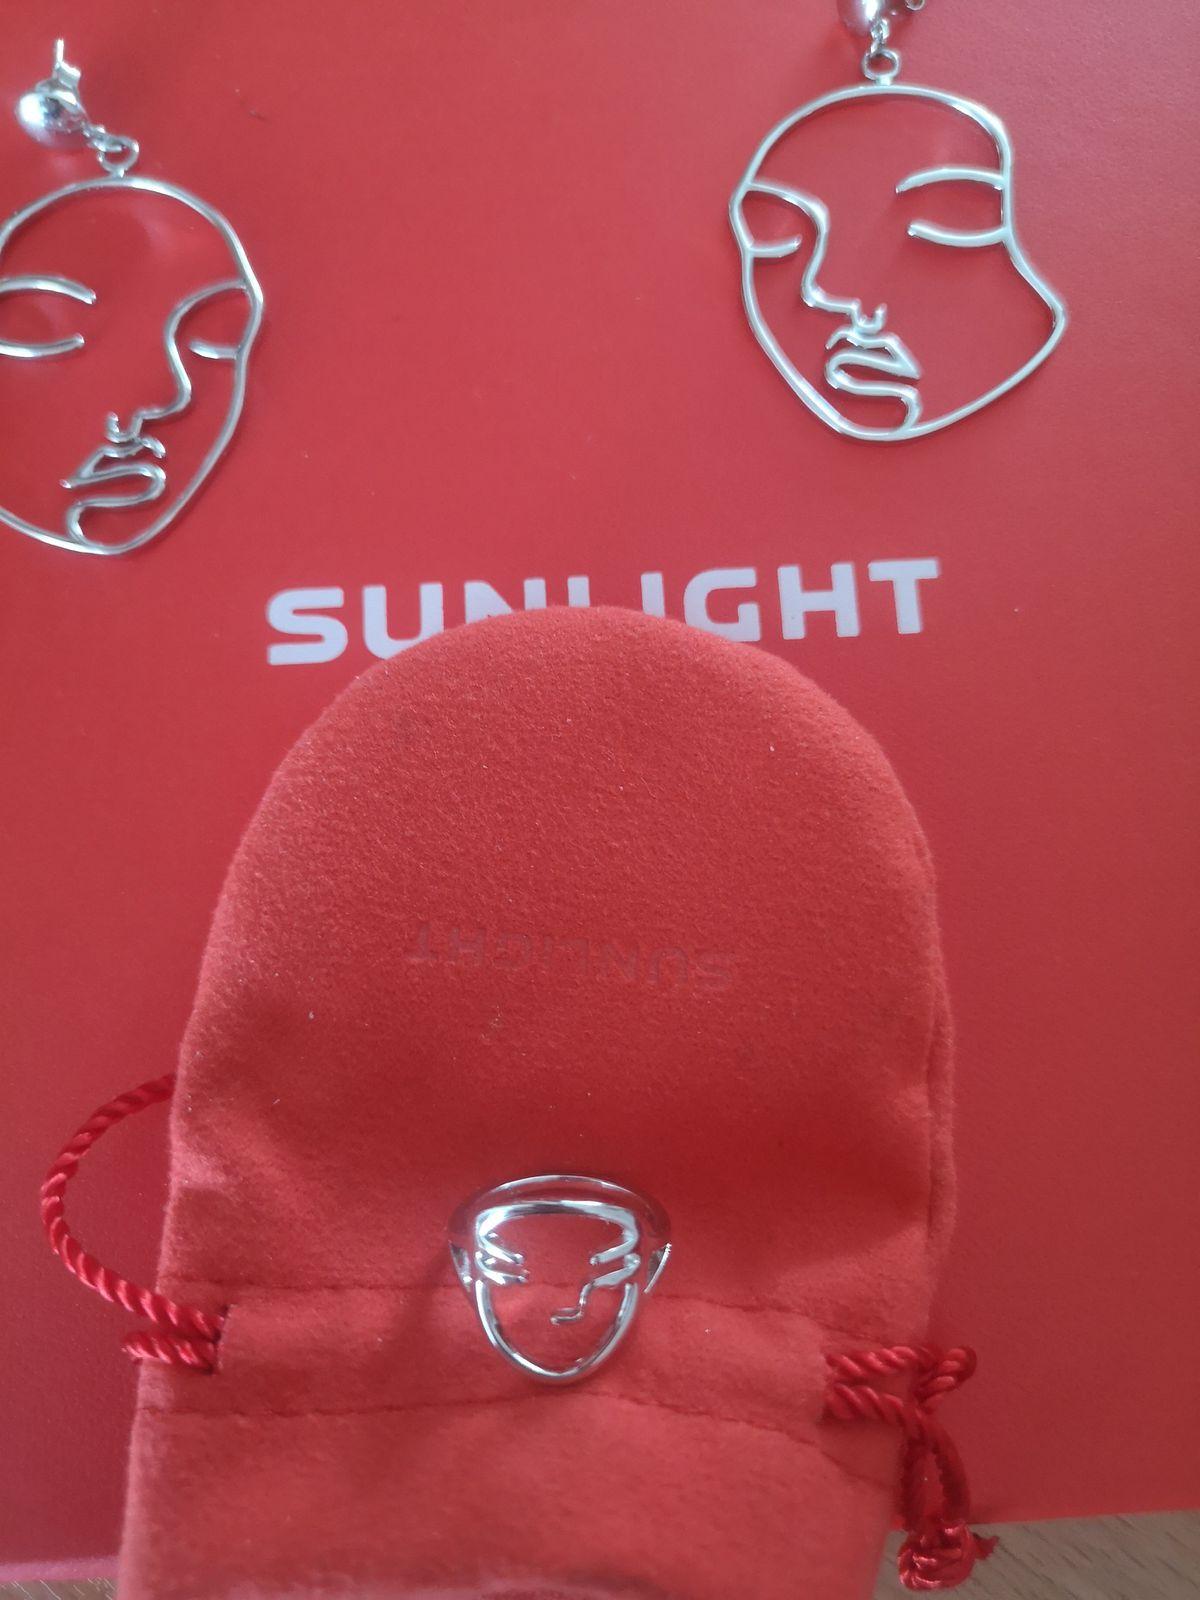 Sunlight-кольцо-круто!